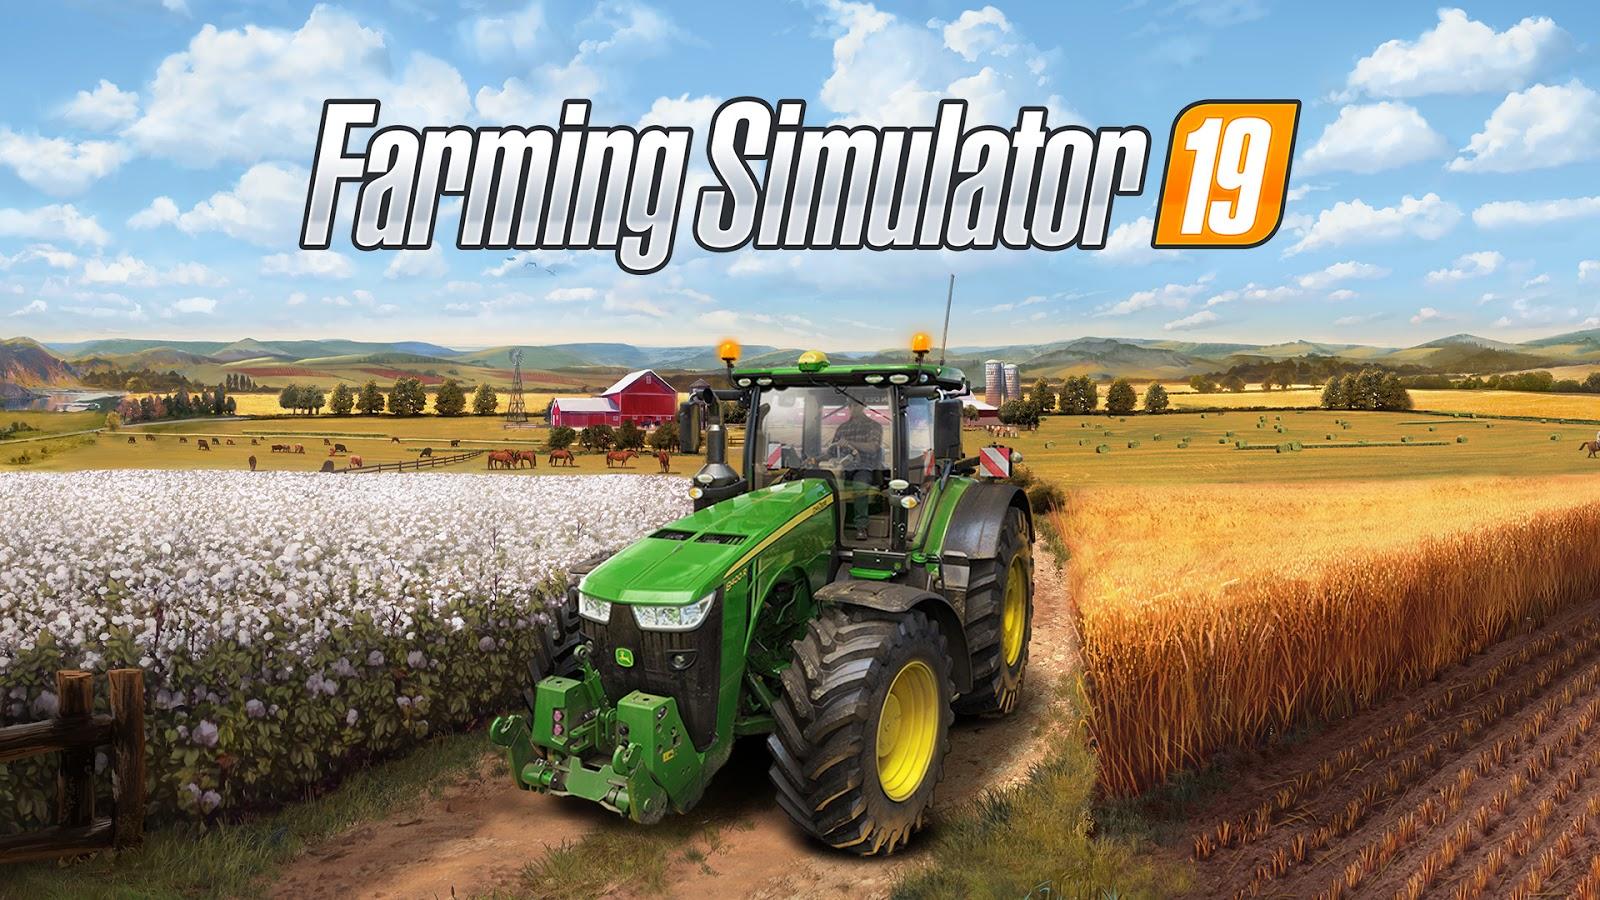 Farming Simulator 19 [Updated to v1 2 0 1 + MULTi18 + DLC